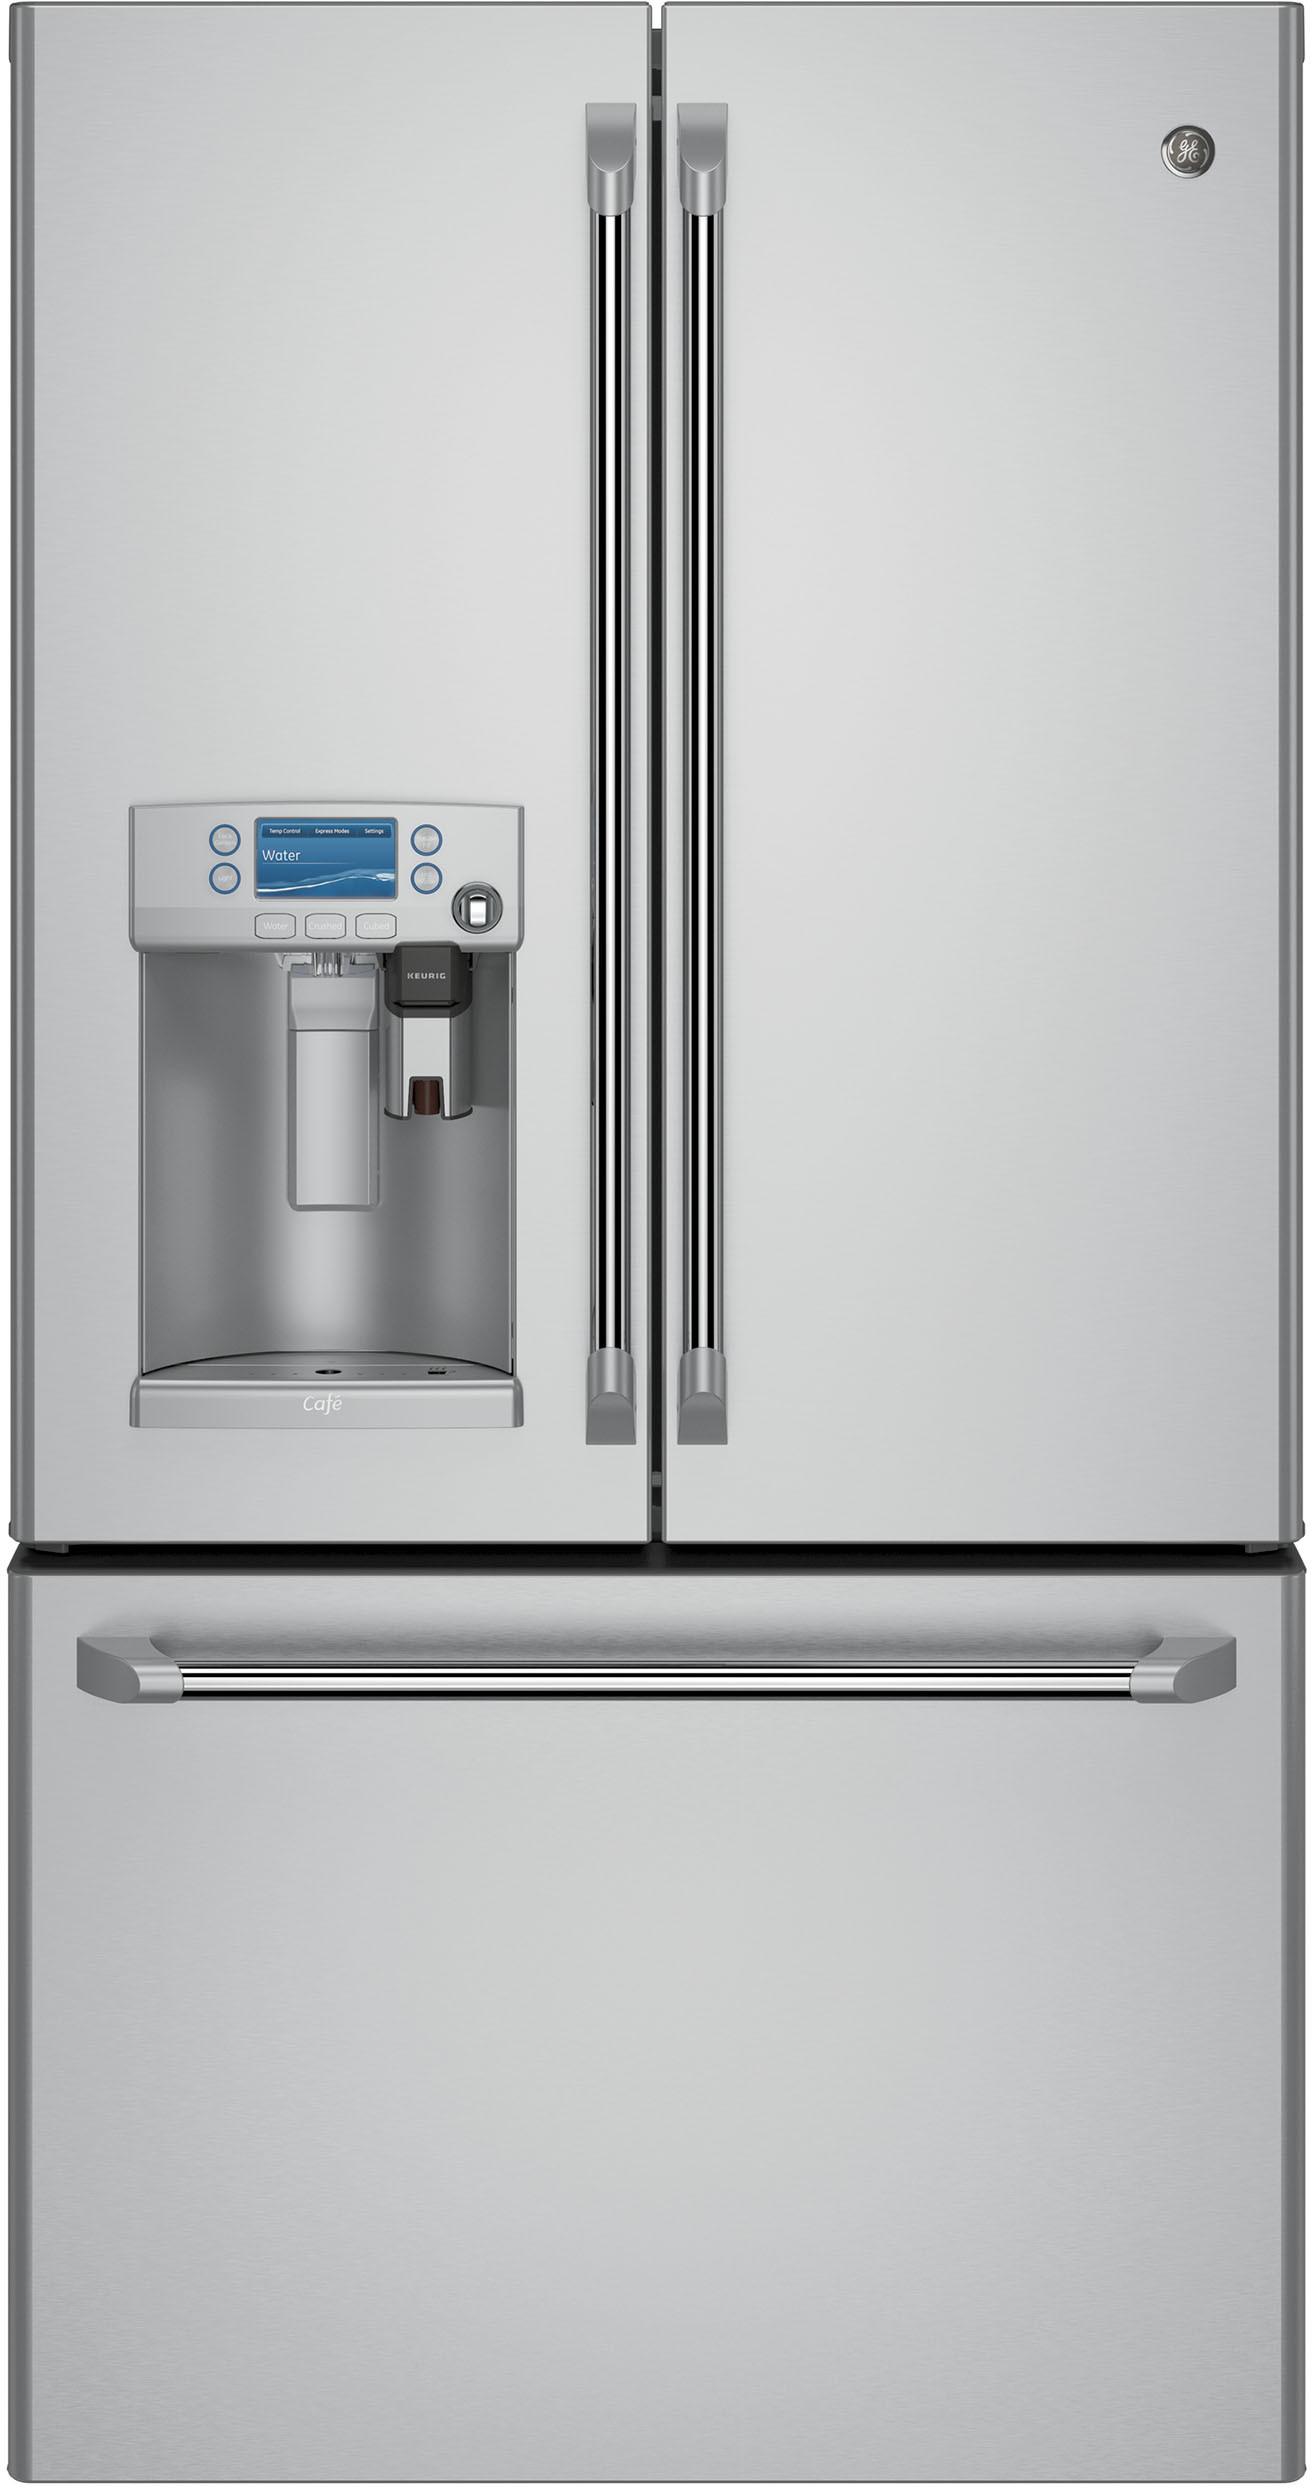 Cye22ushss Ge Keurig Refrigerator With K Cup Coffee Brewing Counter Depth French Door Refrigerator French Doors French Door Refrigerator